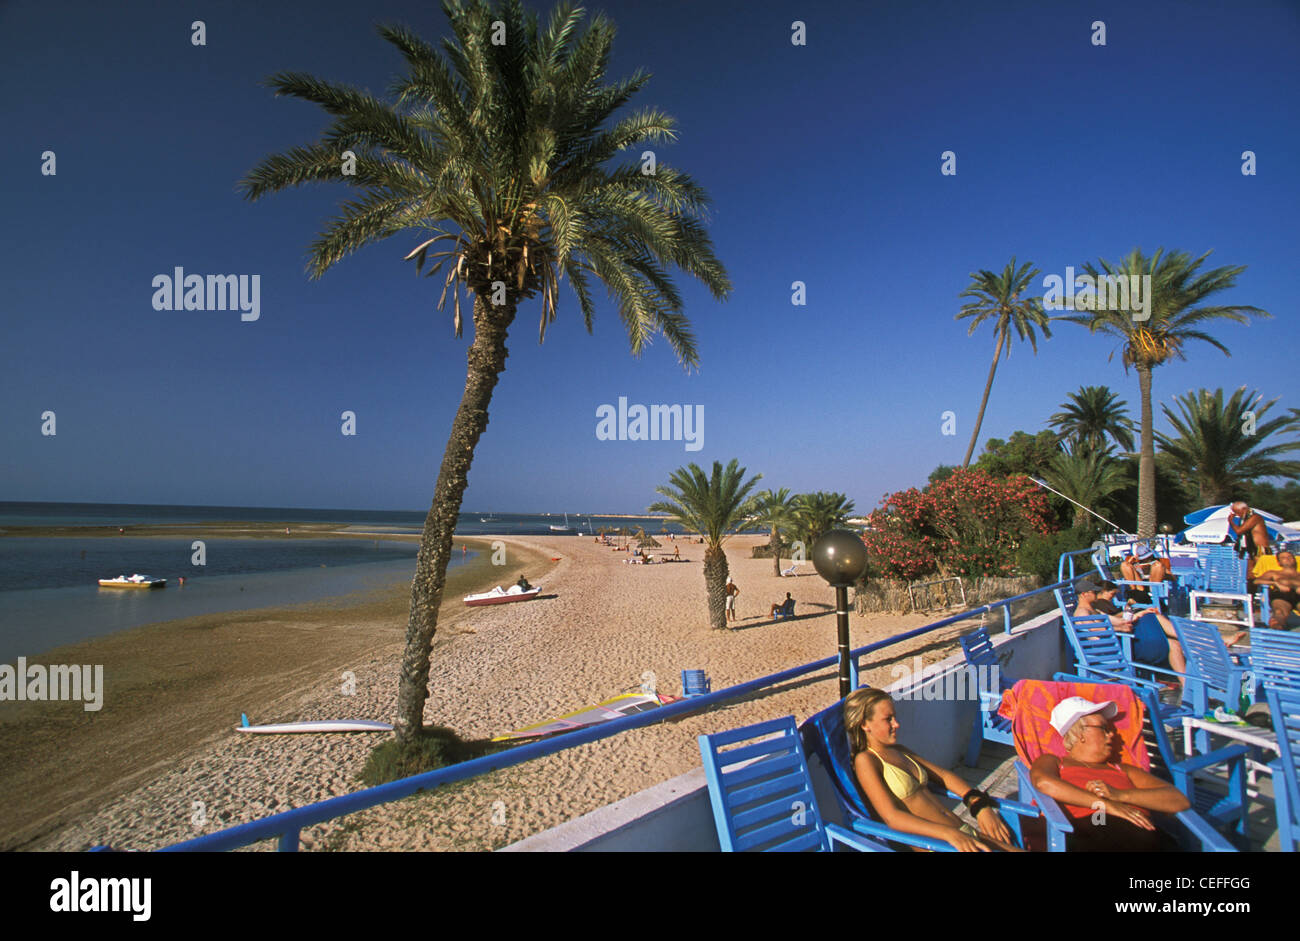 Kerkennah Island Tunisia A View From The Grand Hotel At Sidi Fredj Stock Photo Alamy